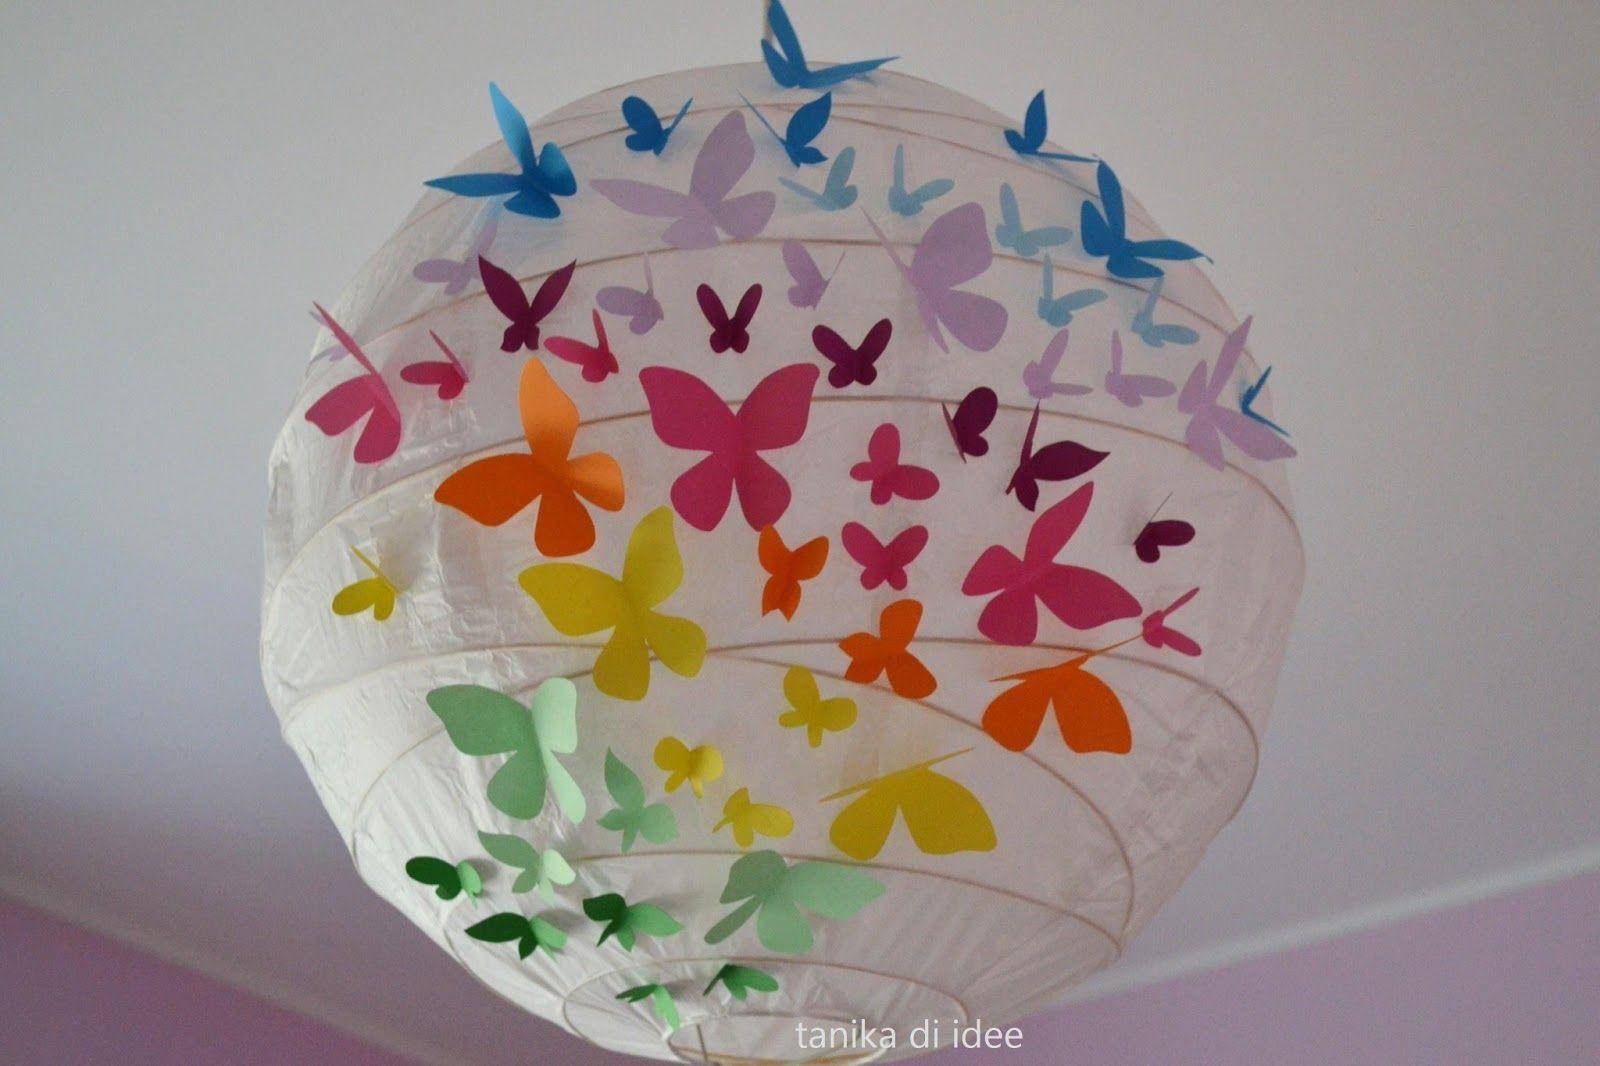 Lampadari Di Carta Per Bambini : Tanika di idee come decorare un lampadario di carta home